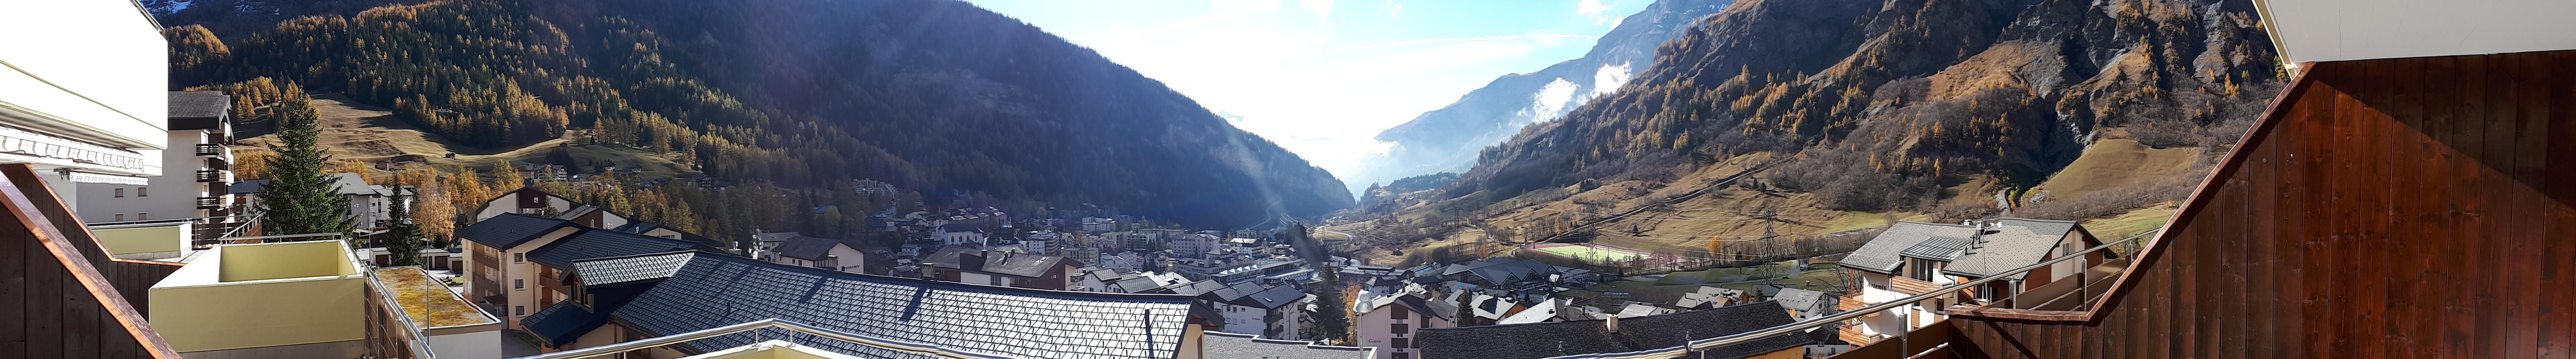 Holiday apartment Tschal  Leukerbad (426689), Leukerbad, Leukerbad, Valais, Switzerland, picture 11